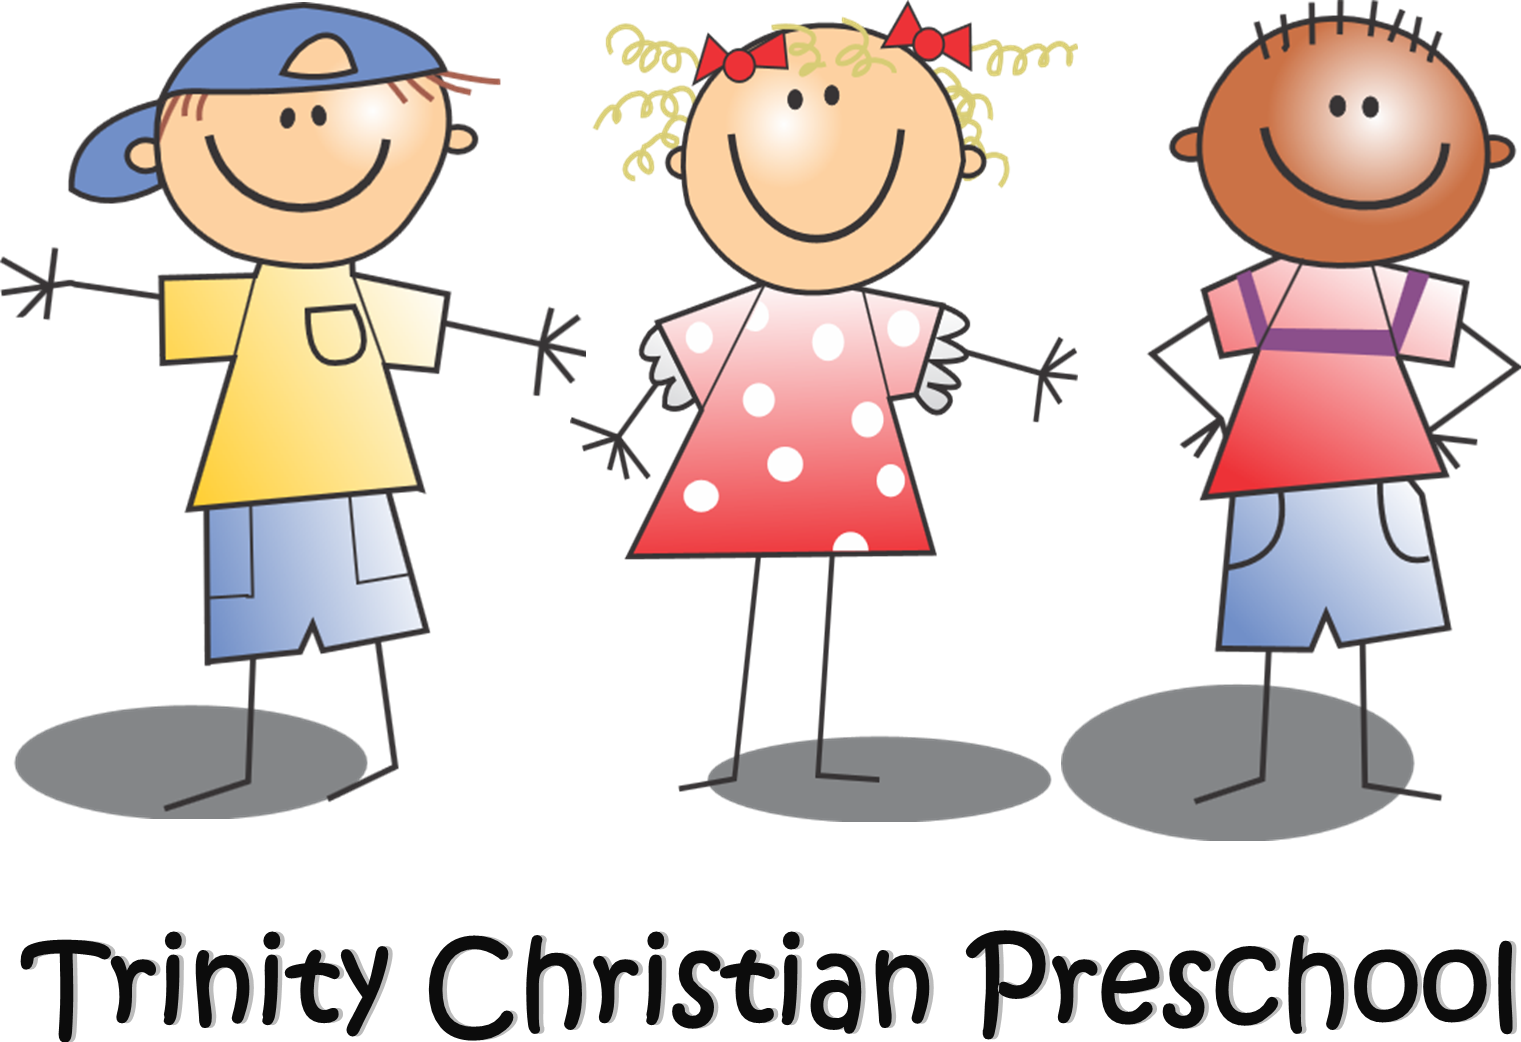 Christian Preschool Cliparts.